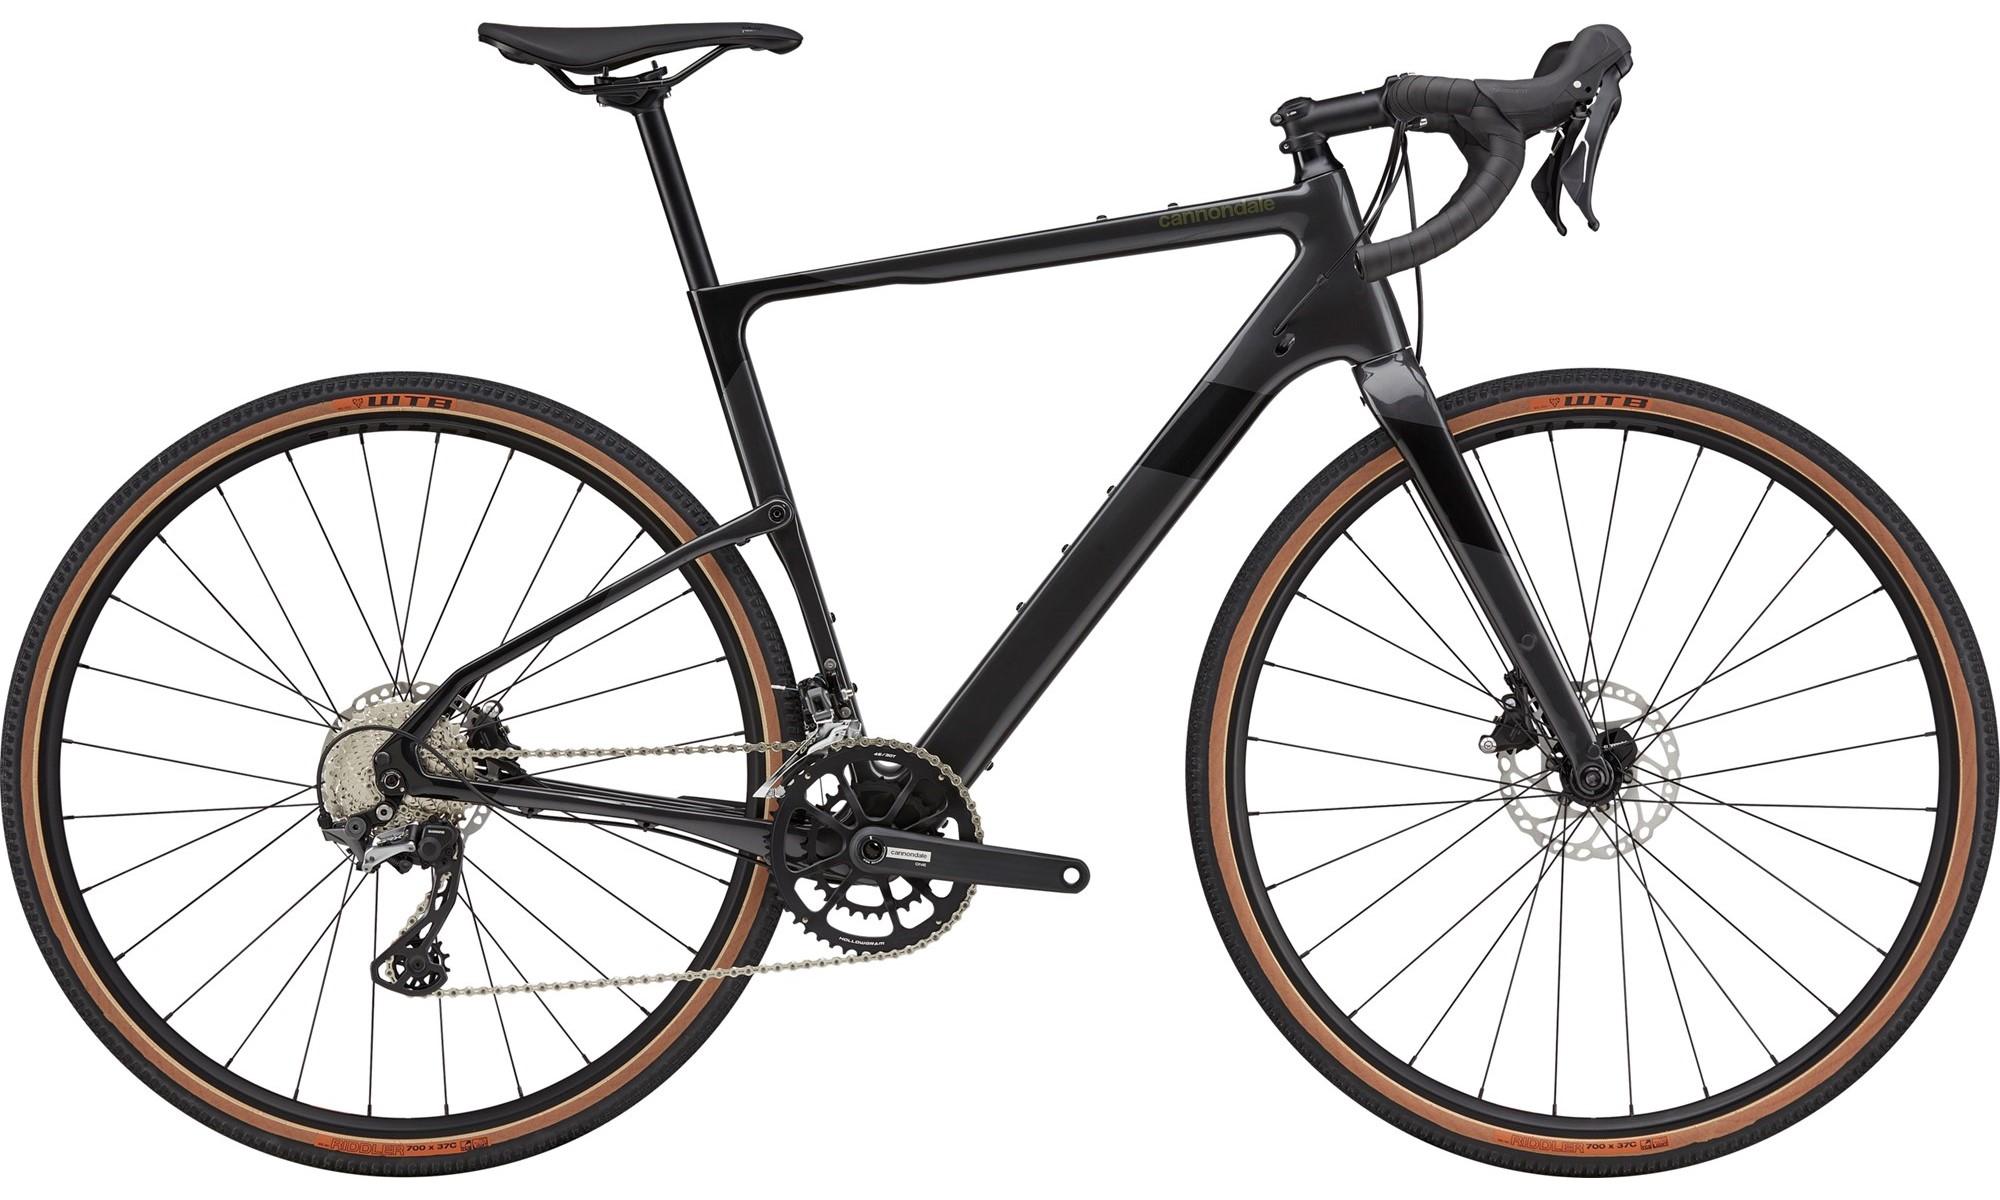 Cannondale Topstone Carbon 5 Gravel Bike 2021 Graphite